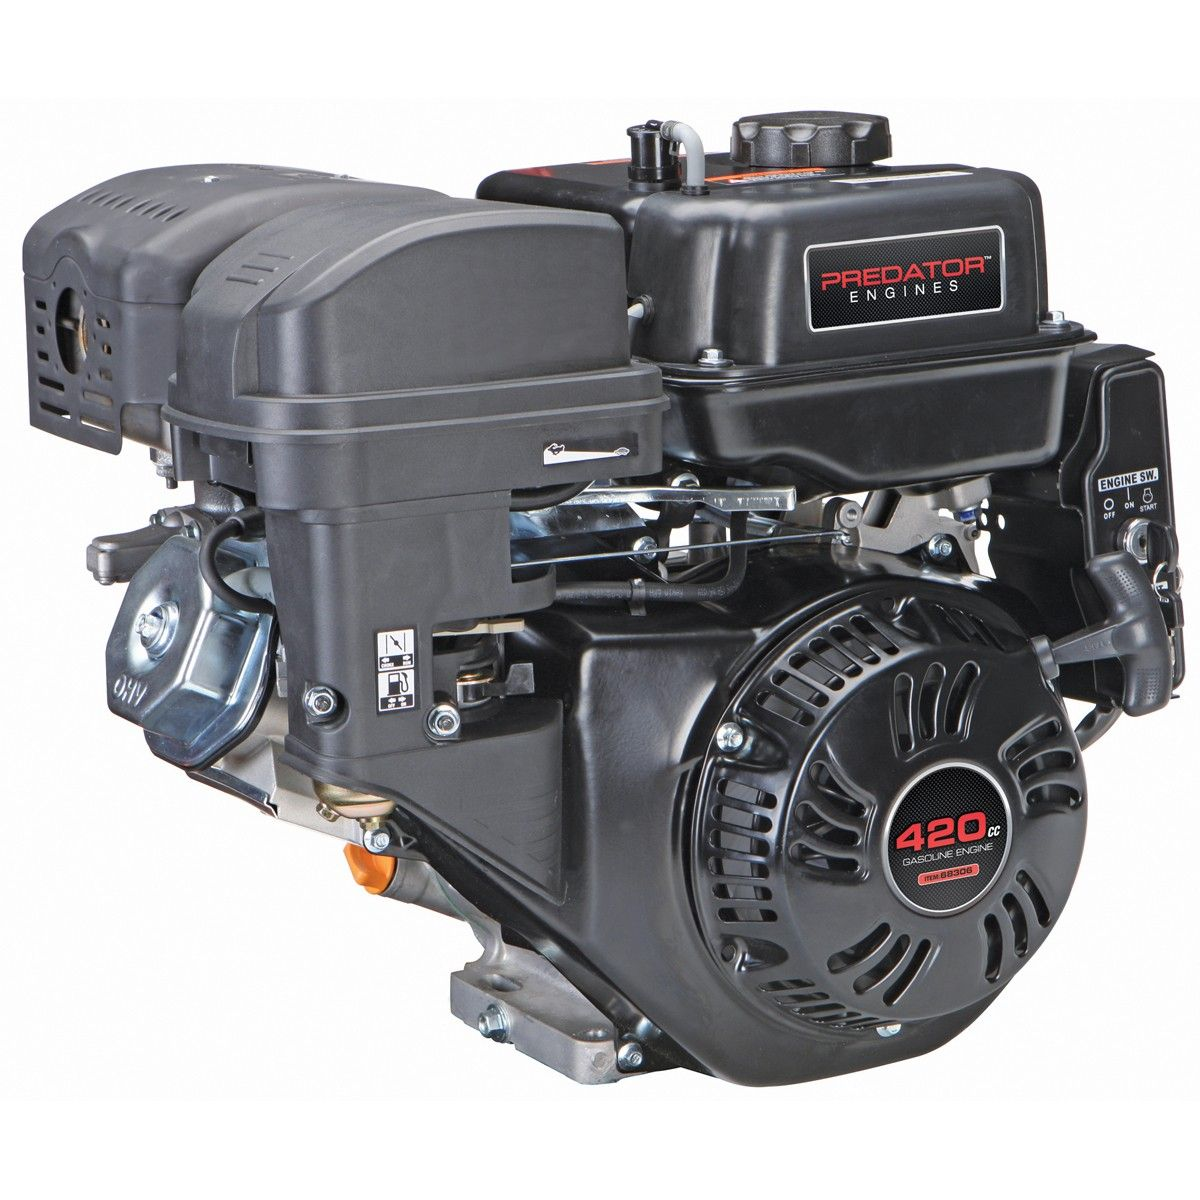 df3204f8f13ef5caaeff9c2579a7e3c0 13 hp (420cc) ohv horizontal shaft gas engine epa carb predator 420cc engine wiring diagram at virtualis.co